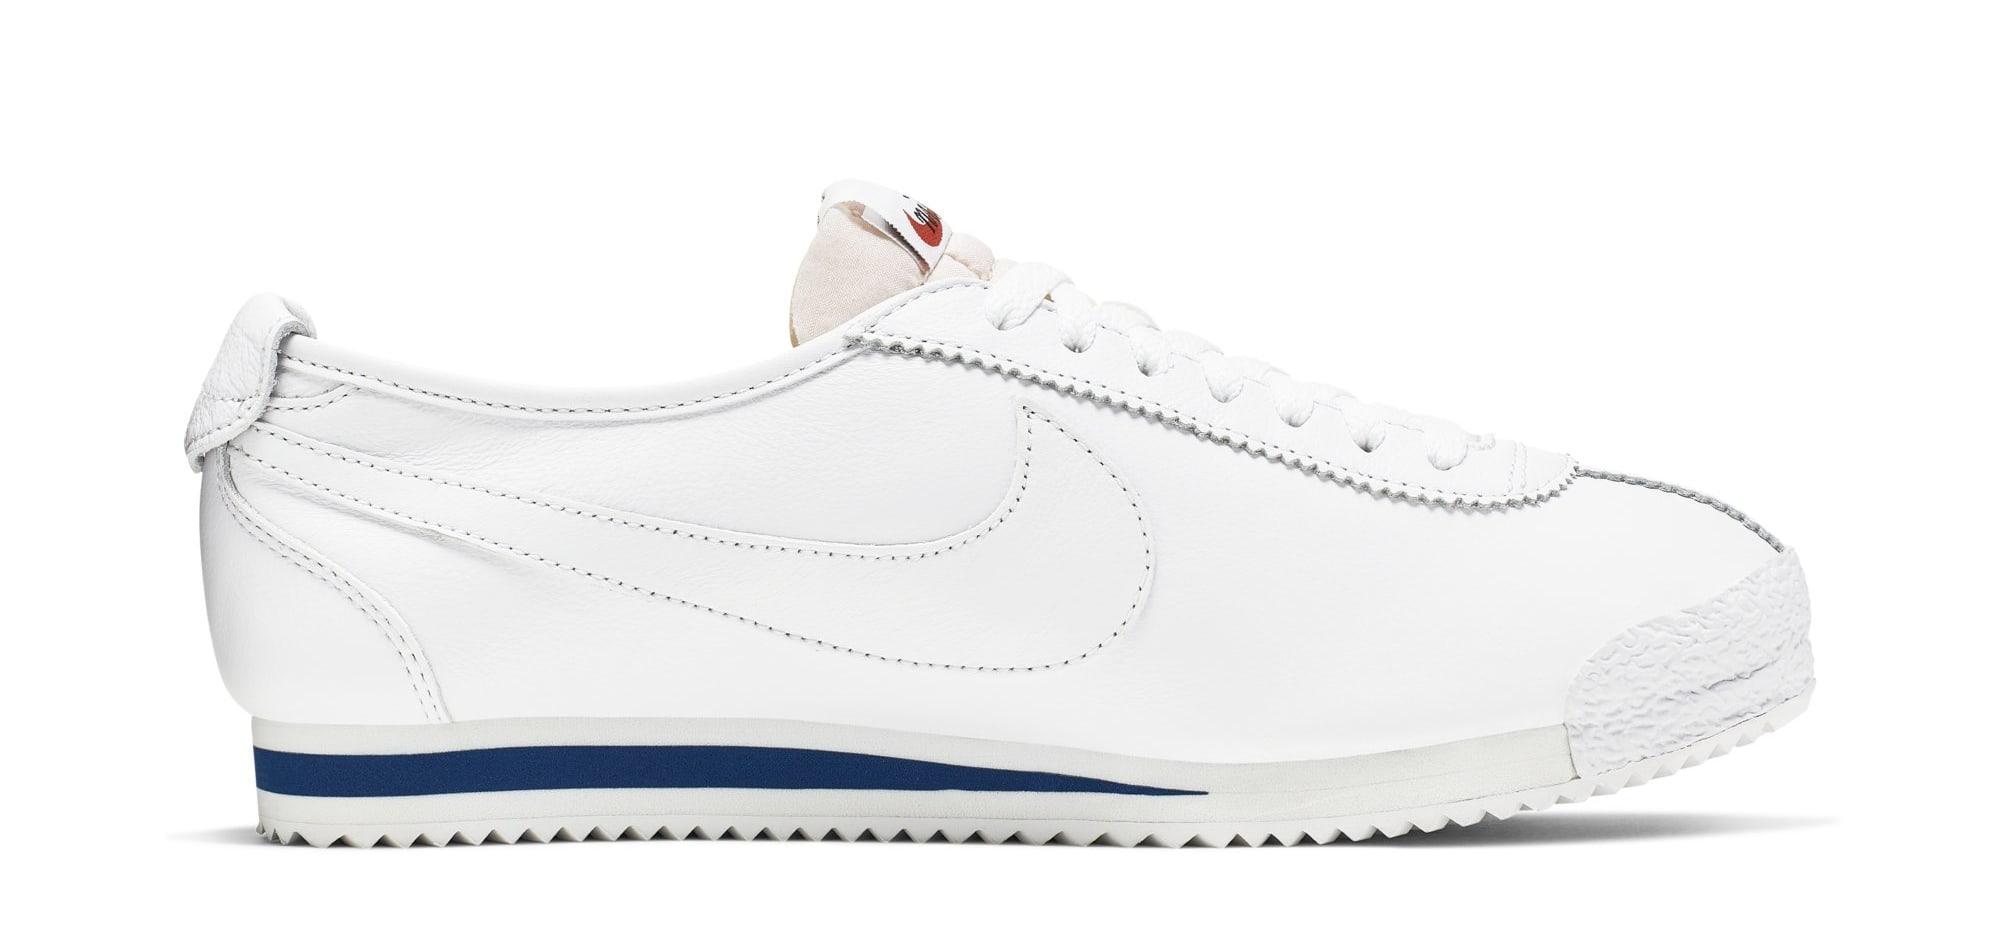 a95c7b565cd Image via Nike Nike Classic Cortez 'Shoe Dog Pack (Falcon)' CJ2586-101  (Medial